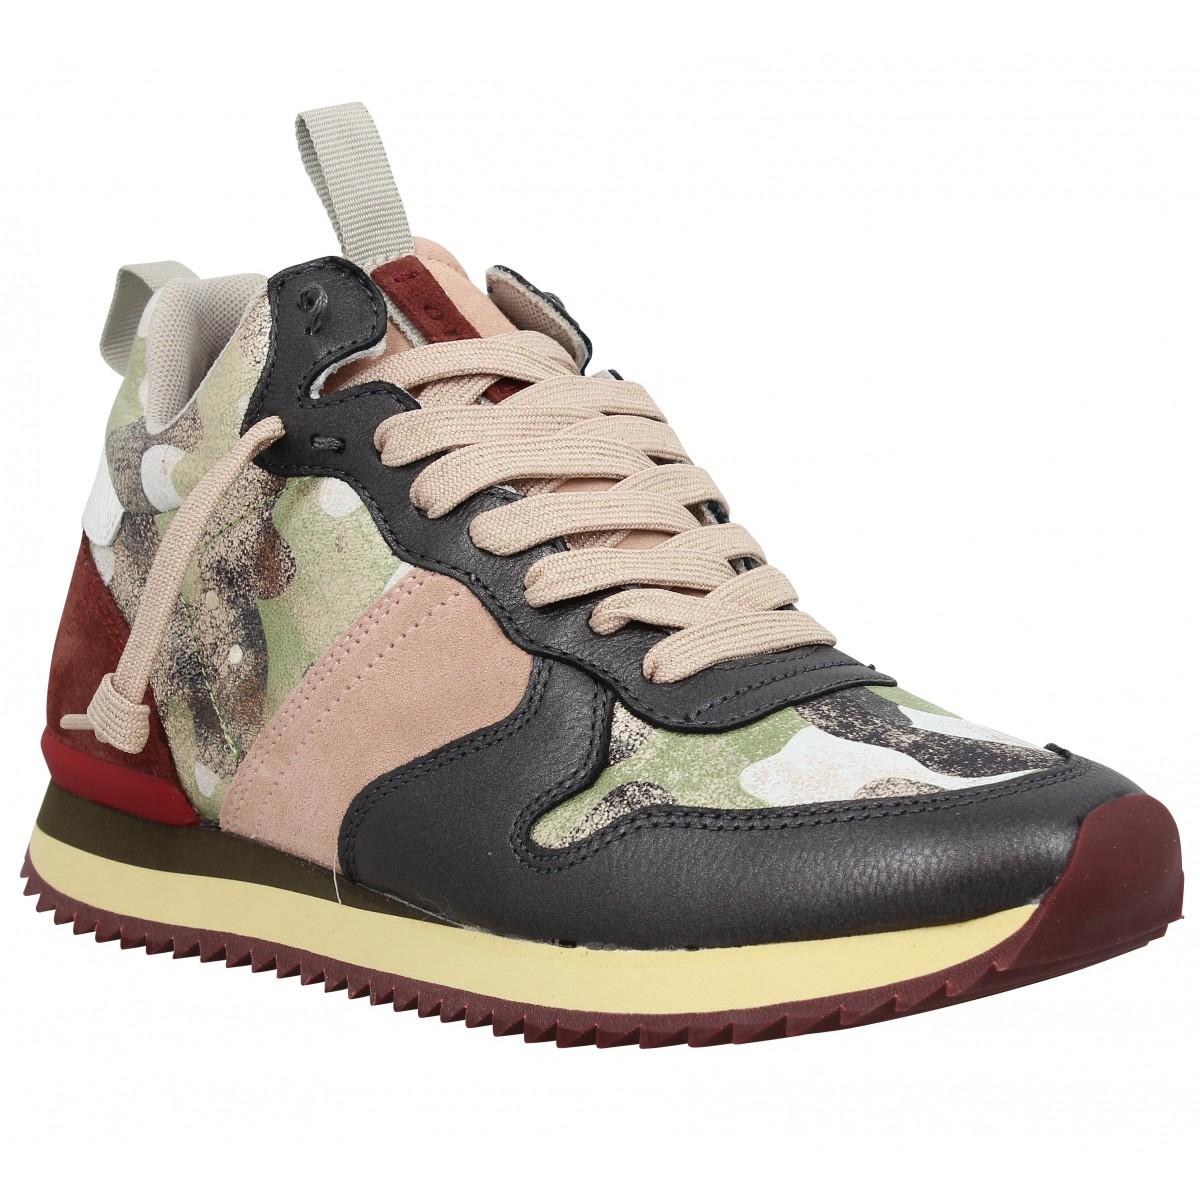 femme street femme chaussures camo Fanny 0 cuir 105 UvRcvpf